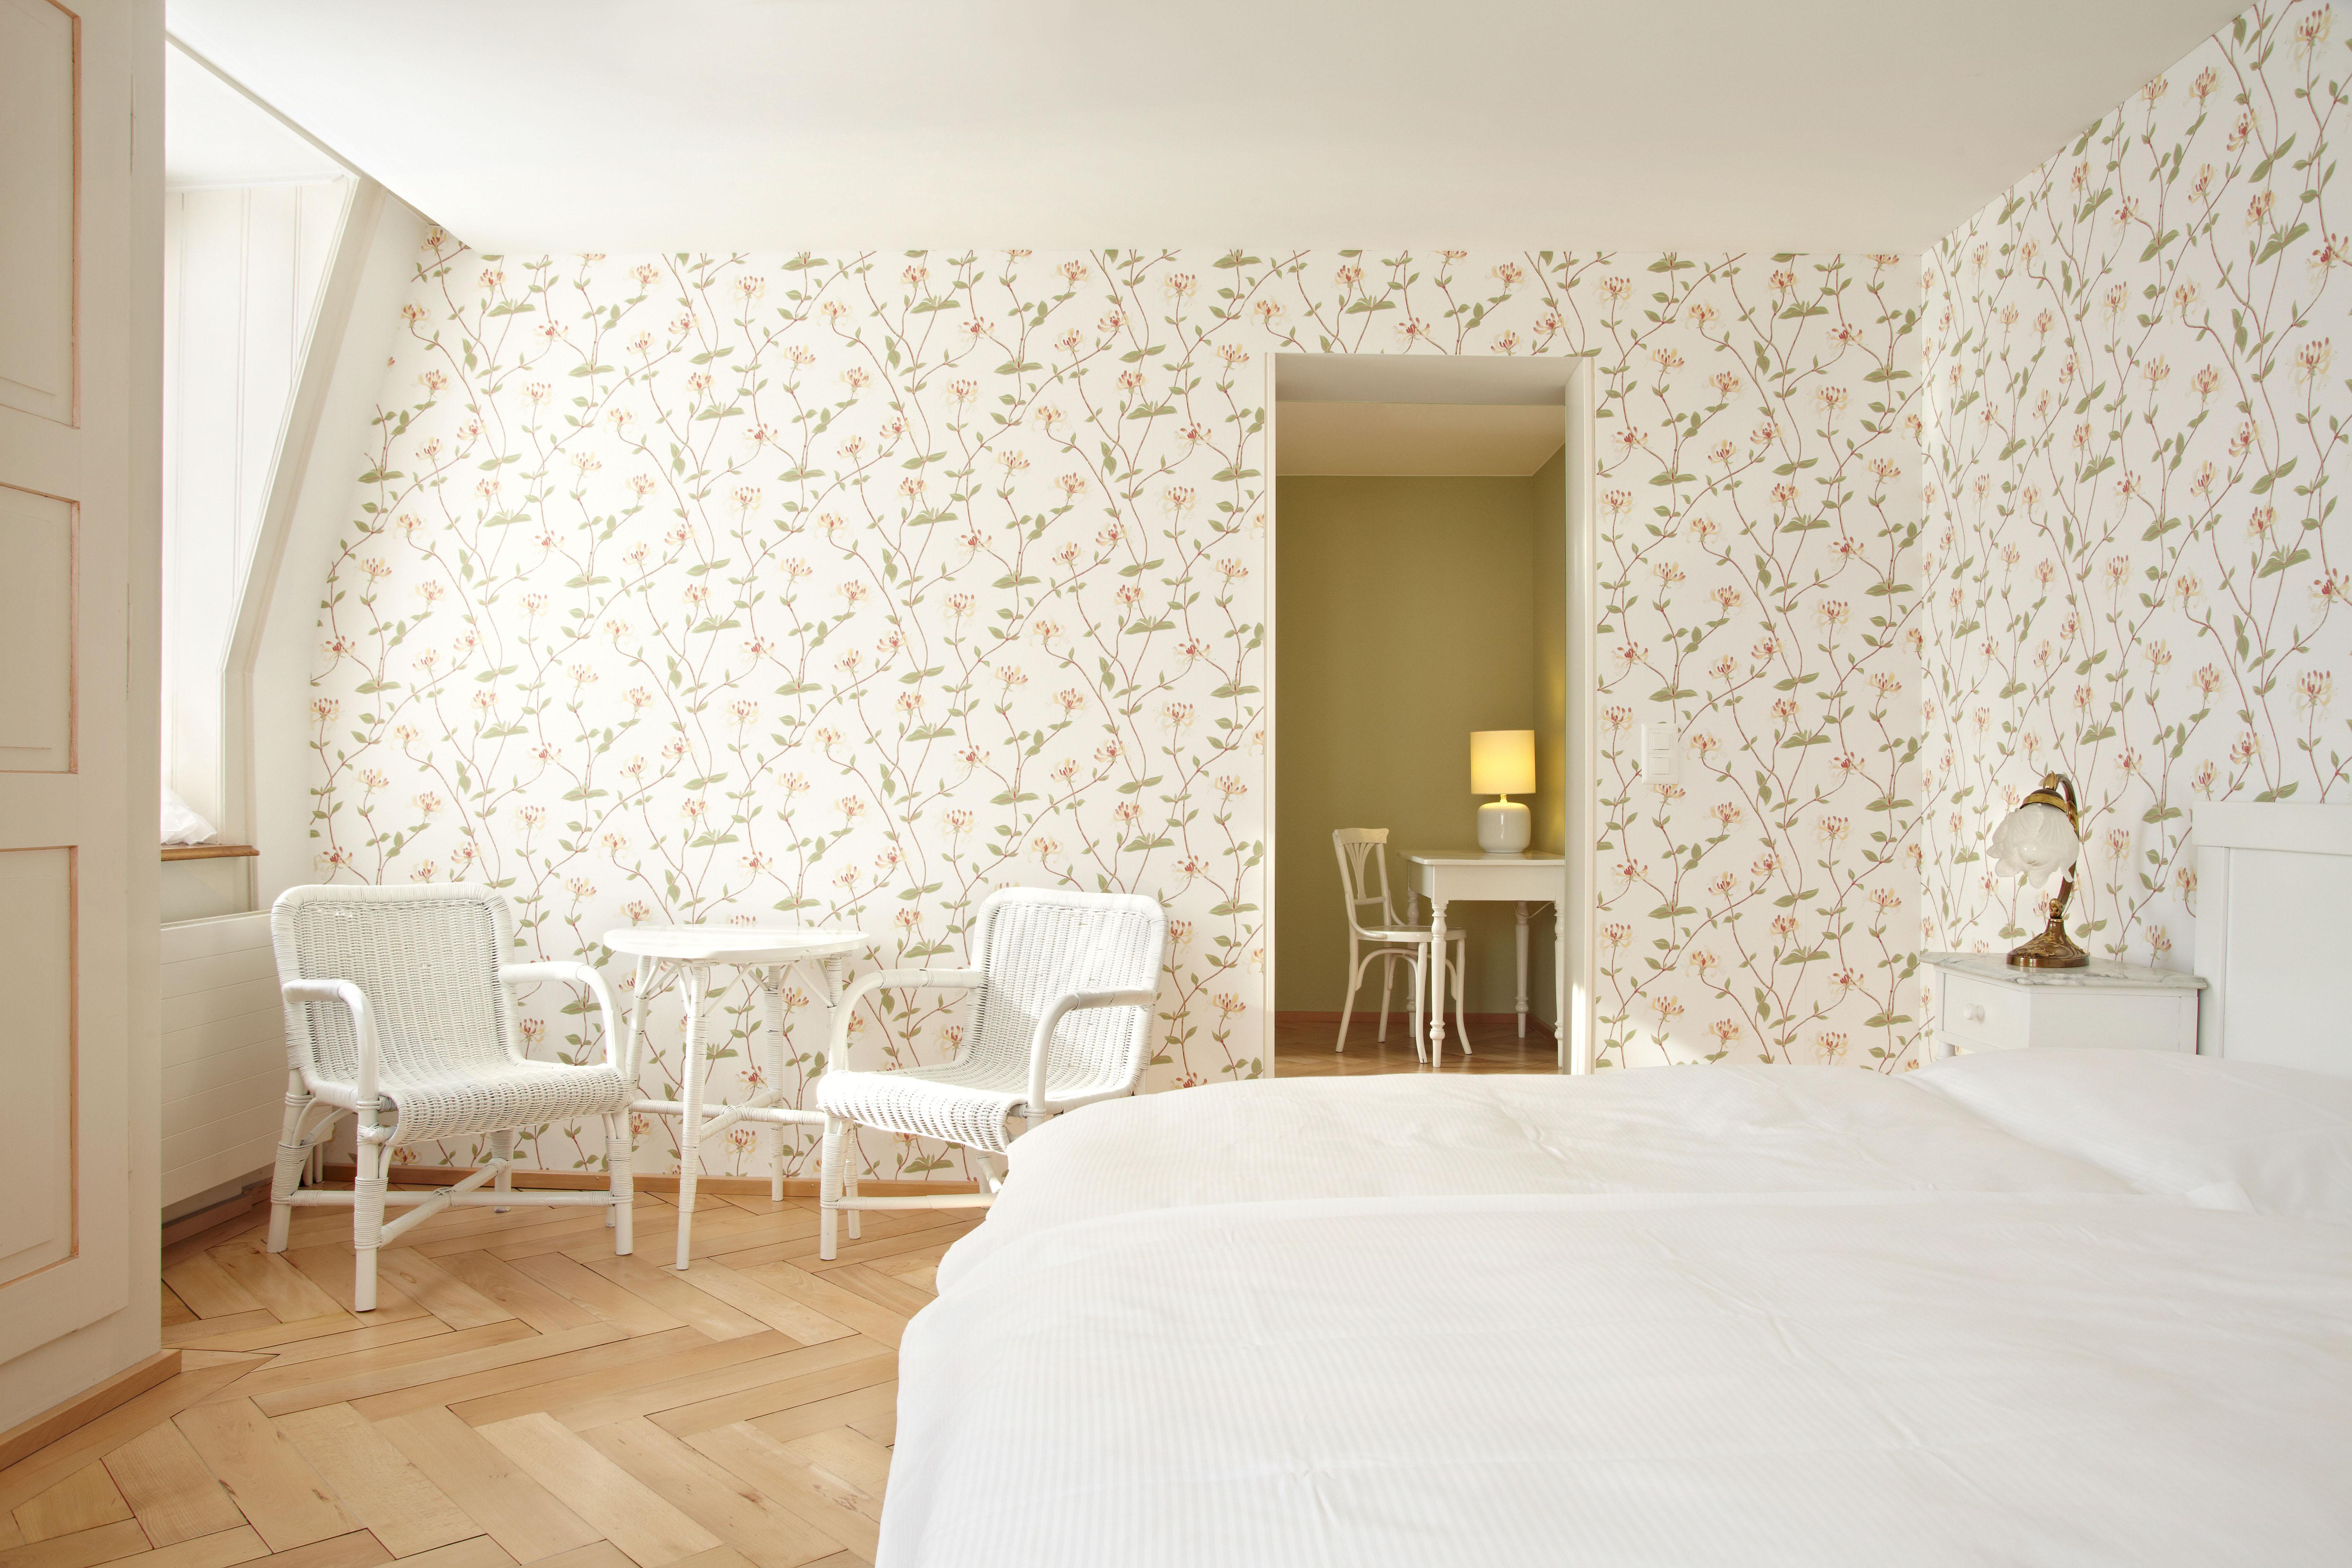 superiorzimmer 305 hotel terrasse am see. Black Bedroom Furniture Sets. Home Design Ideas